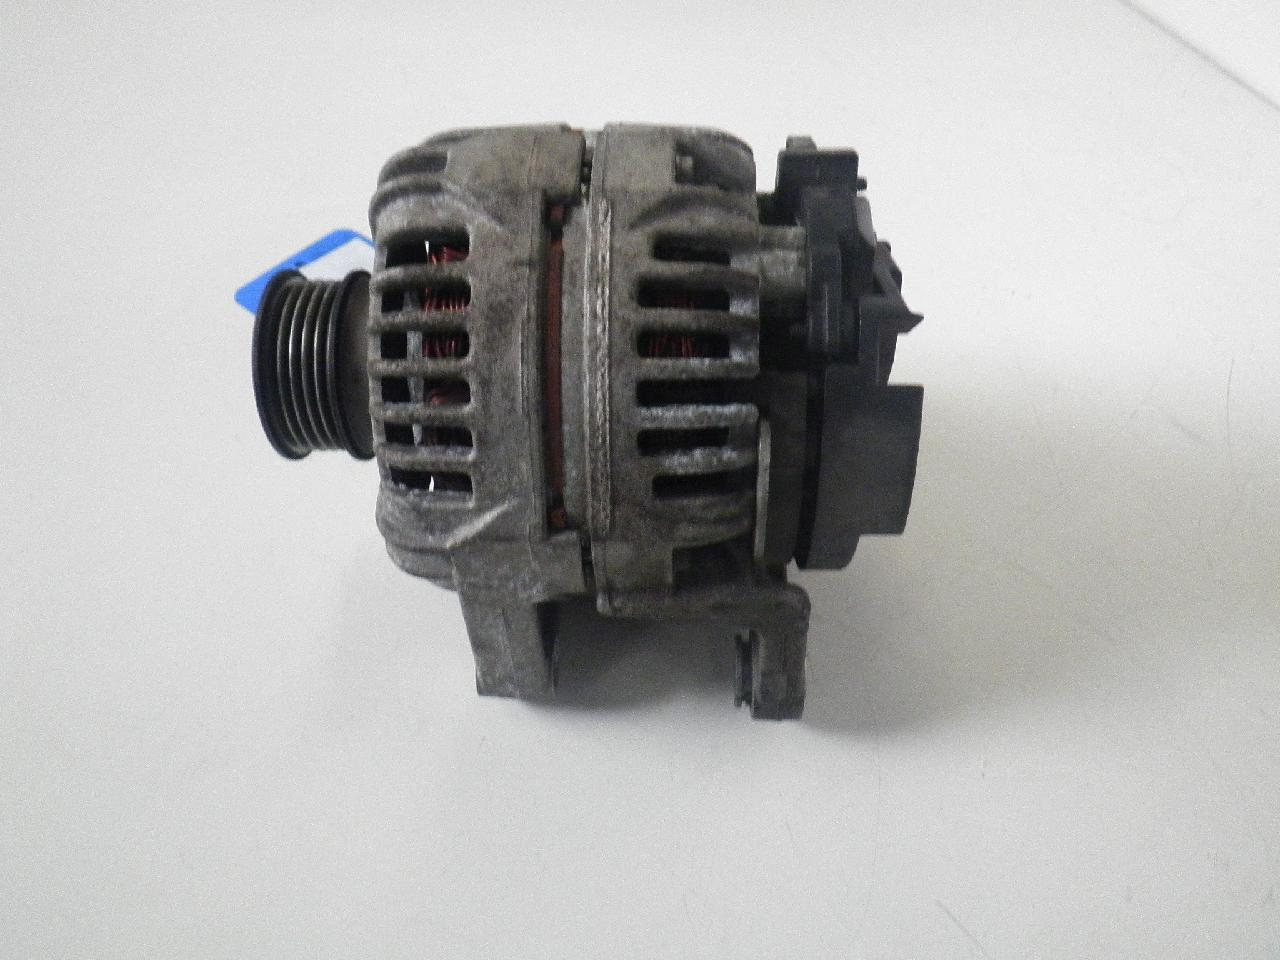 0124425005 generator lichtmaschine opel astra g cc t98 1. Black Bedroom Furniture Sets. Home Design Ideas